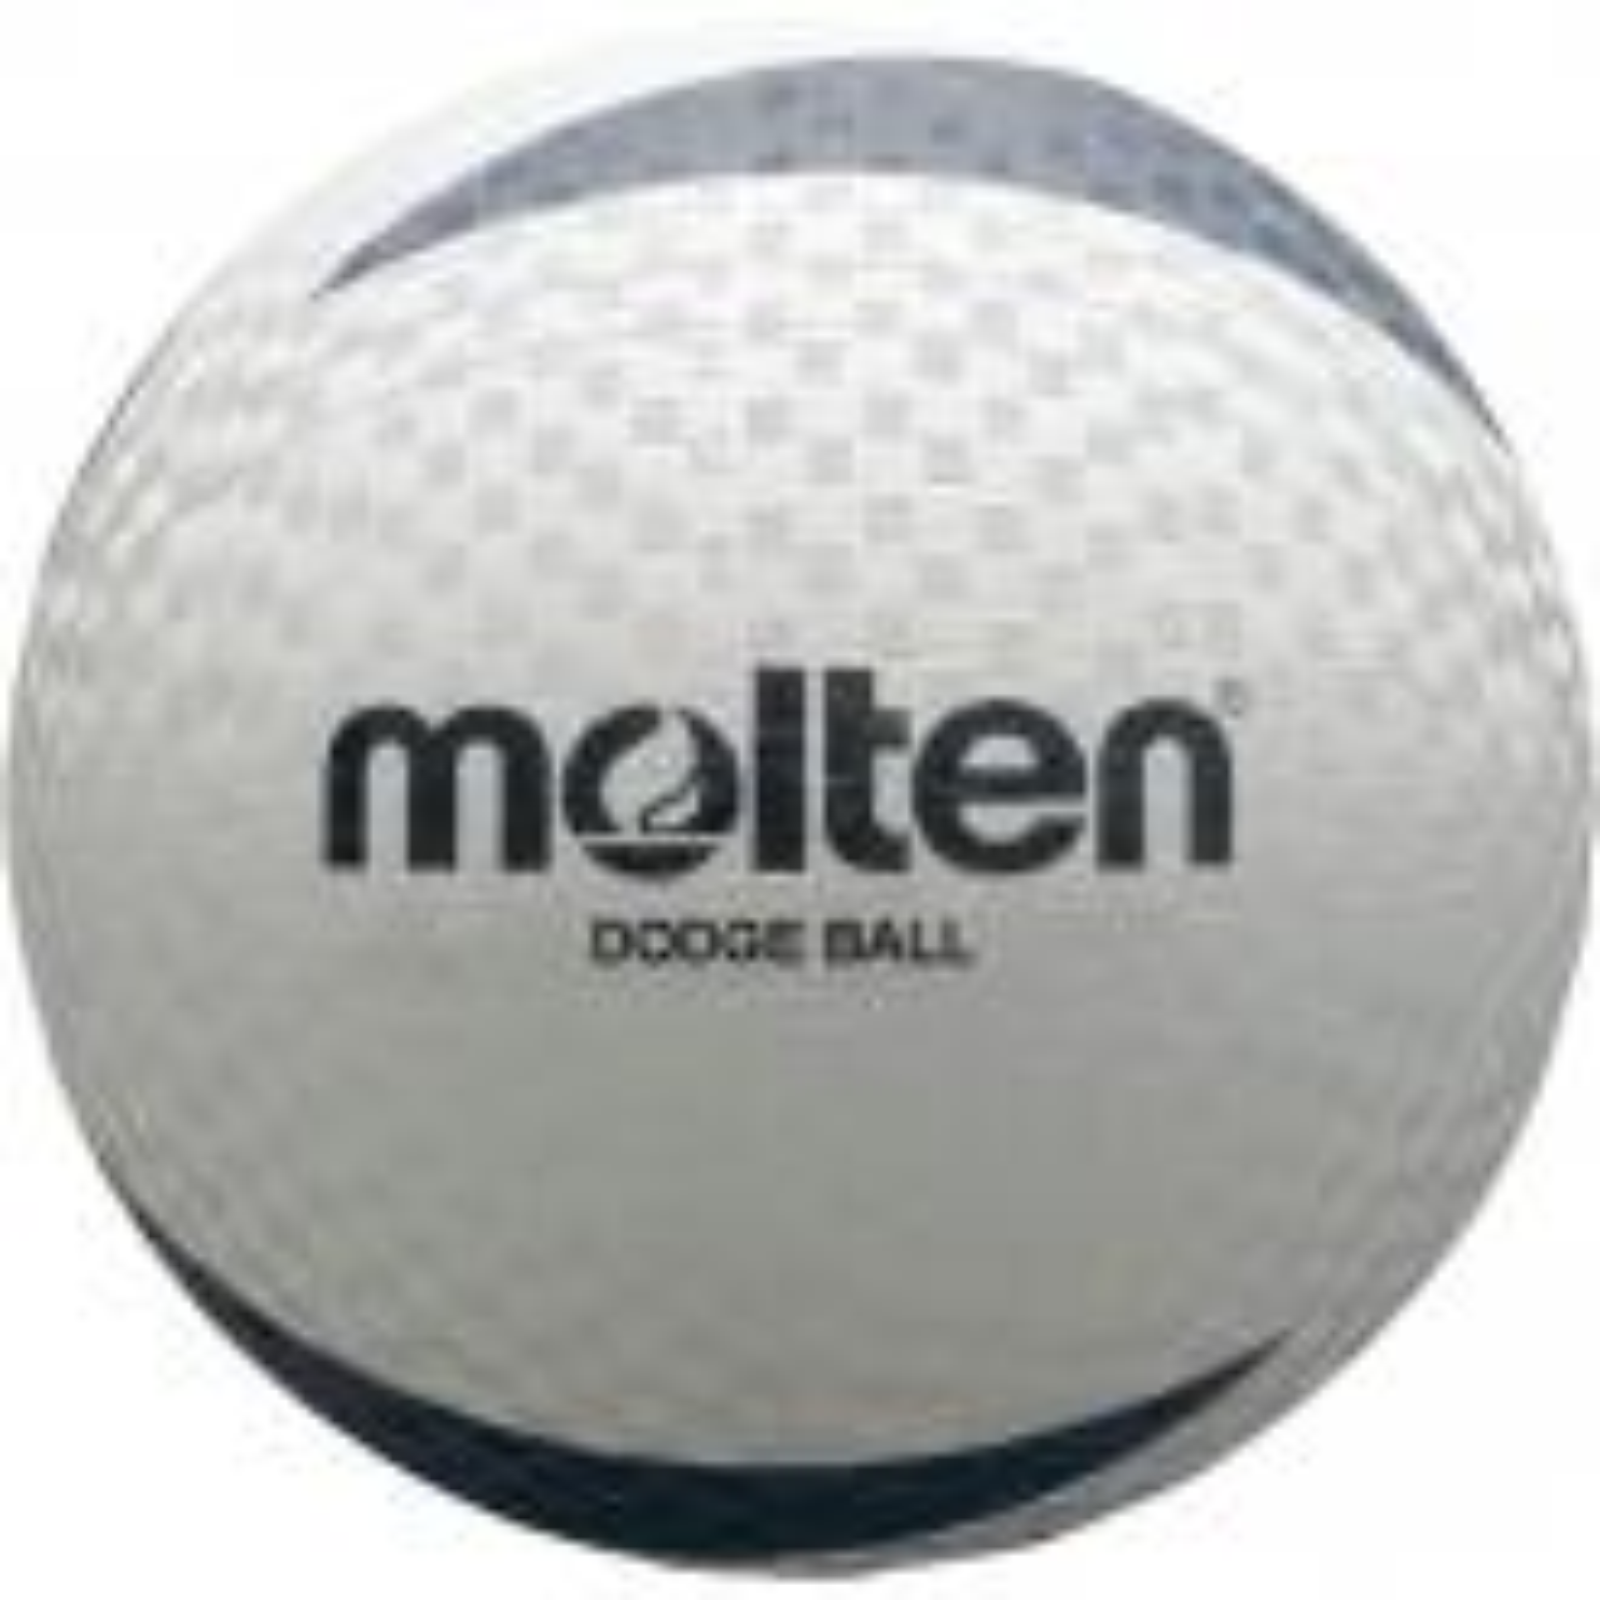 Handball, Dodgeball and Lacrosse